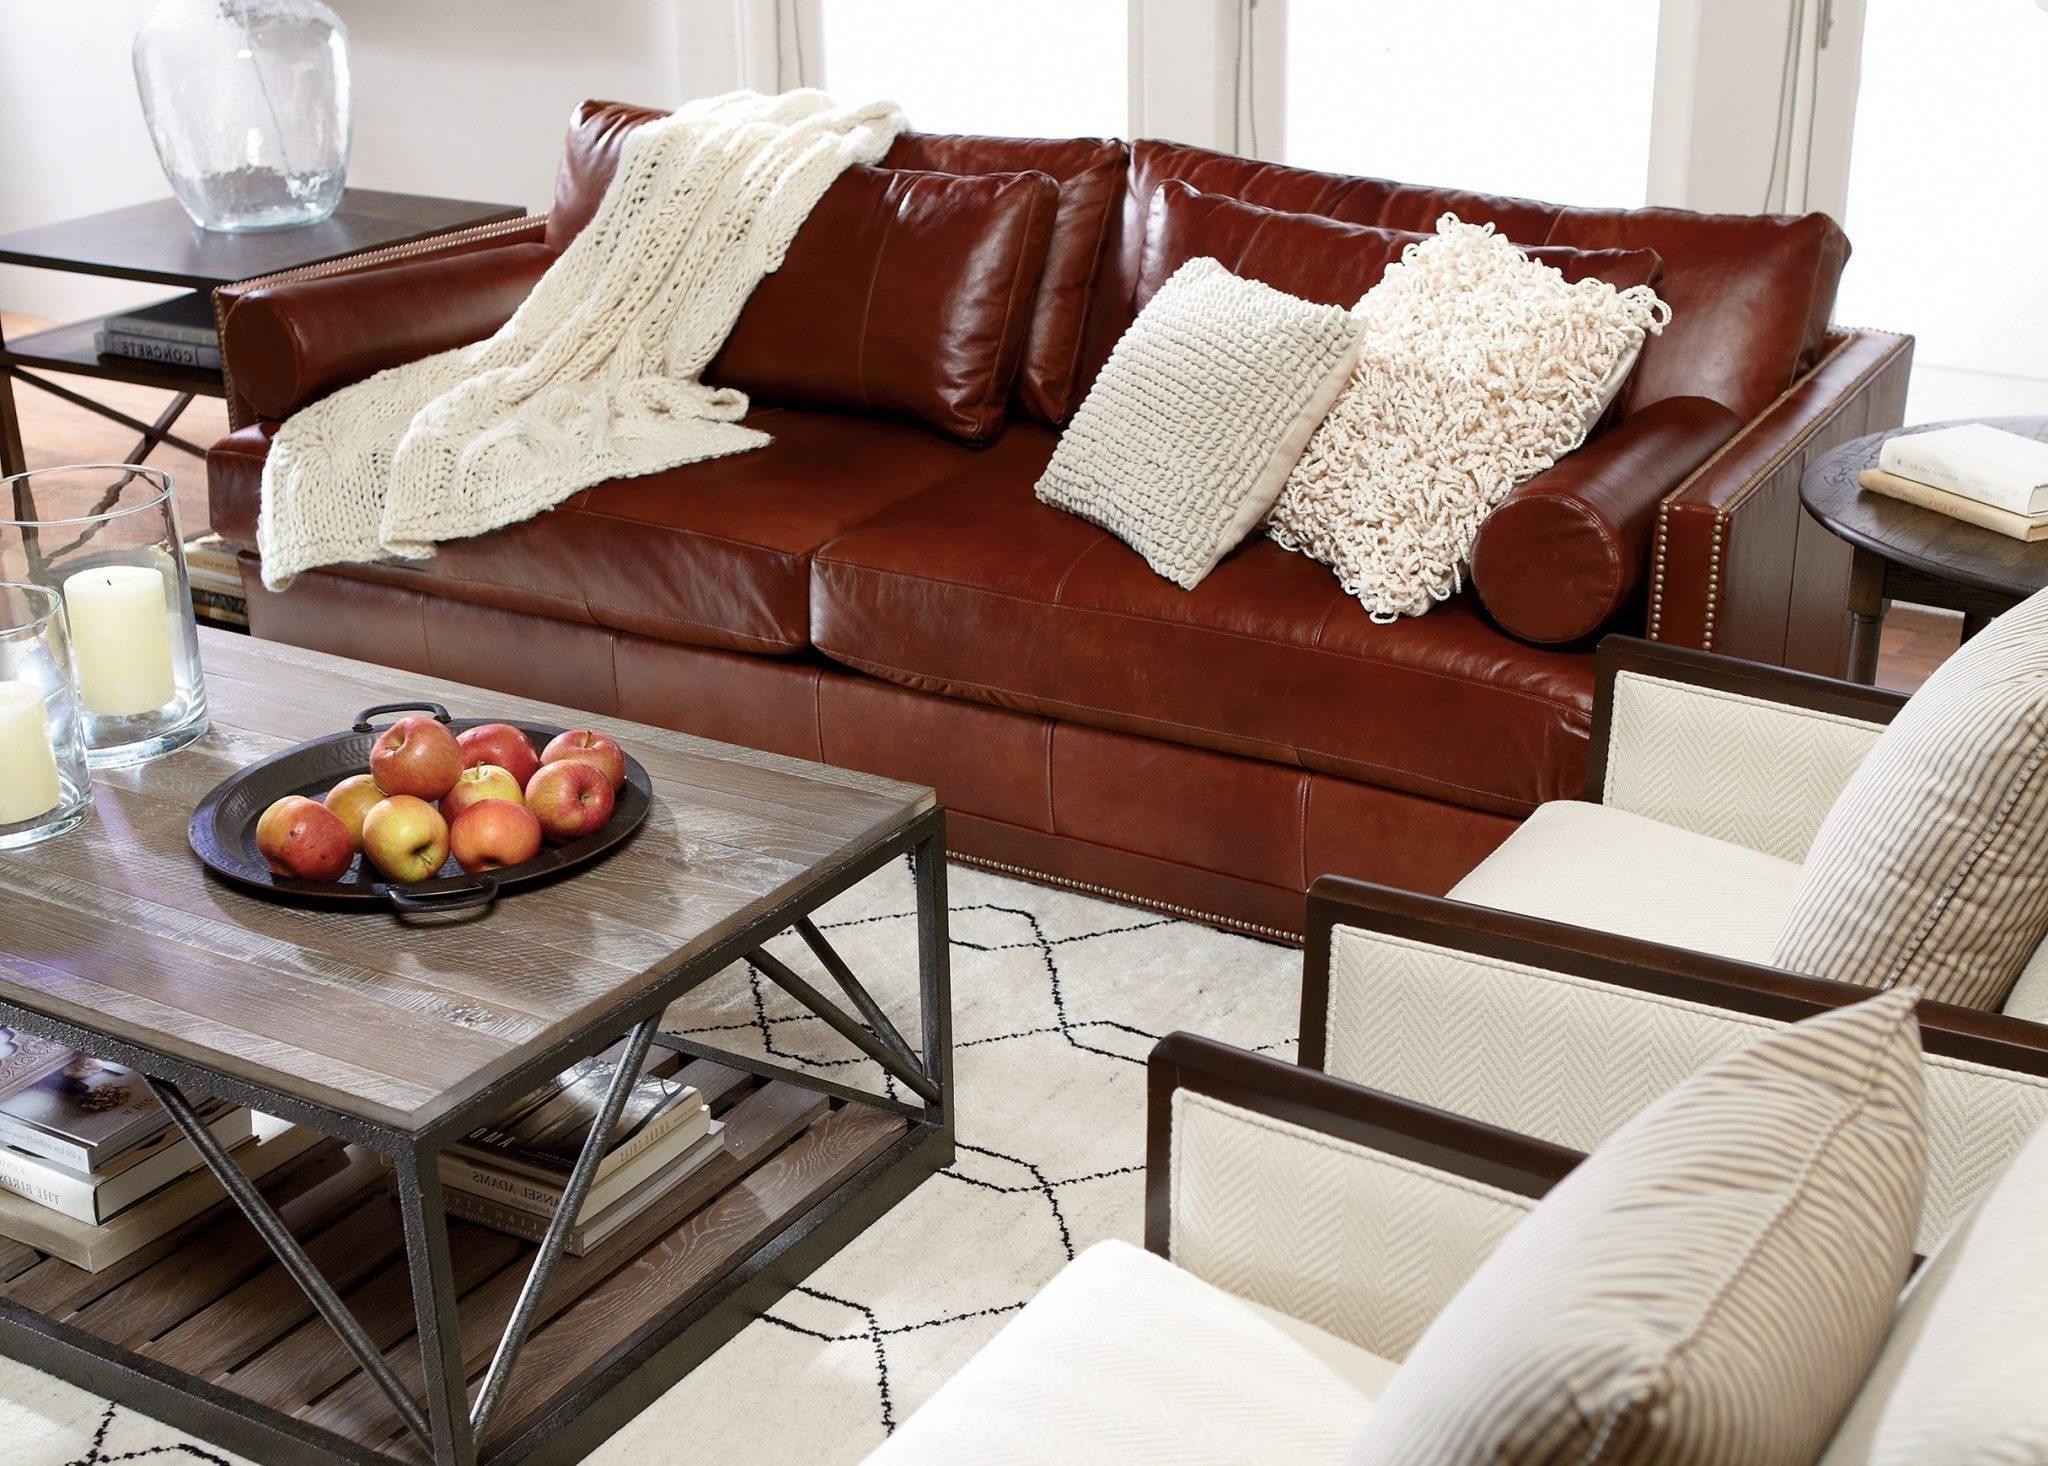 chadwick sofa chesterfield blackpool sofascore 20 top sofas ideas